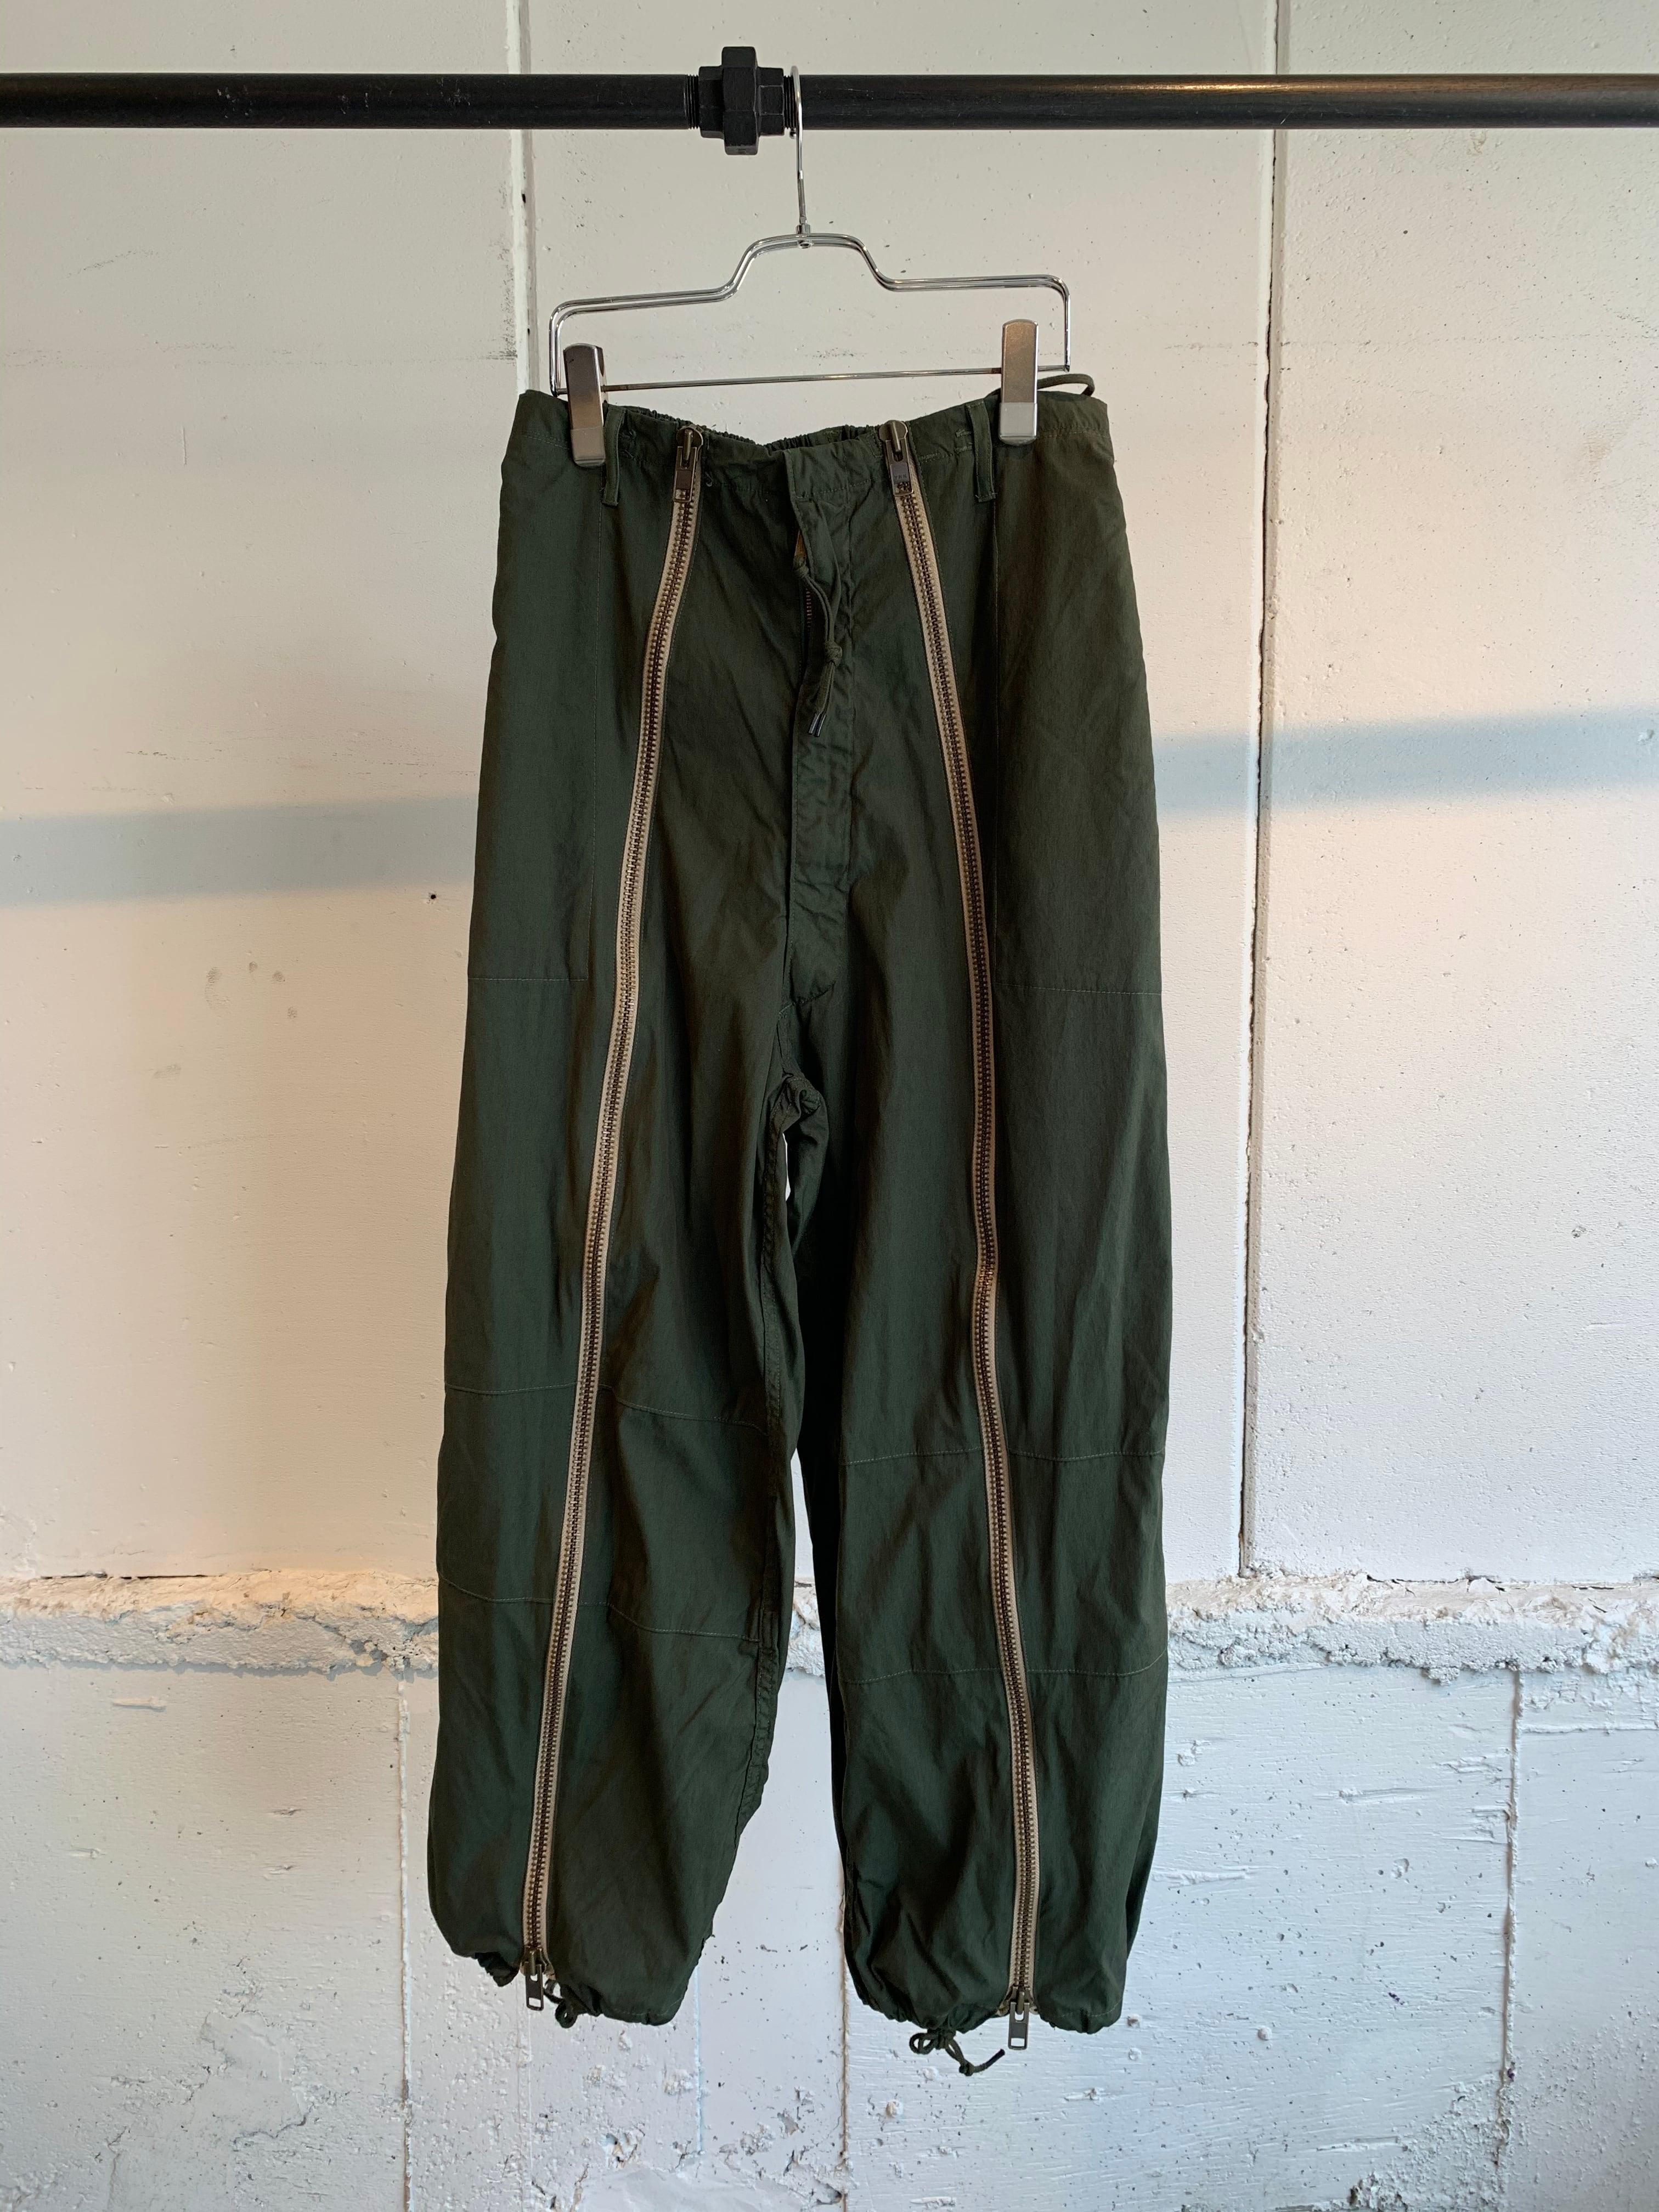 77circa circa make front zip snowcamouflage pants (Olive)